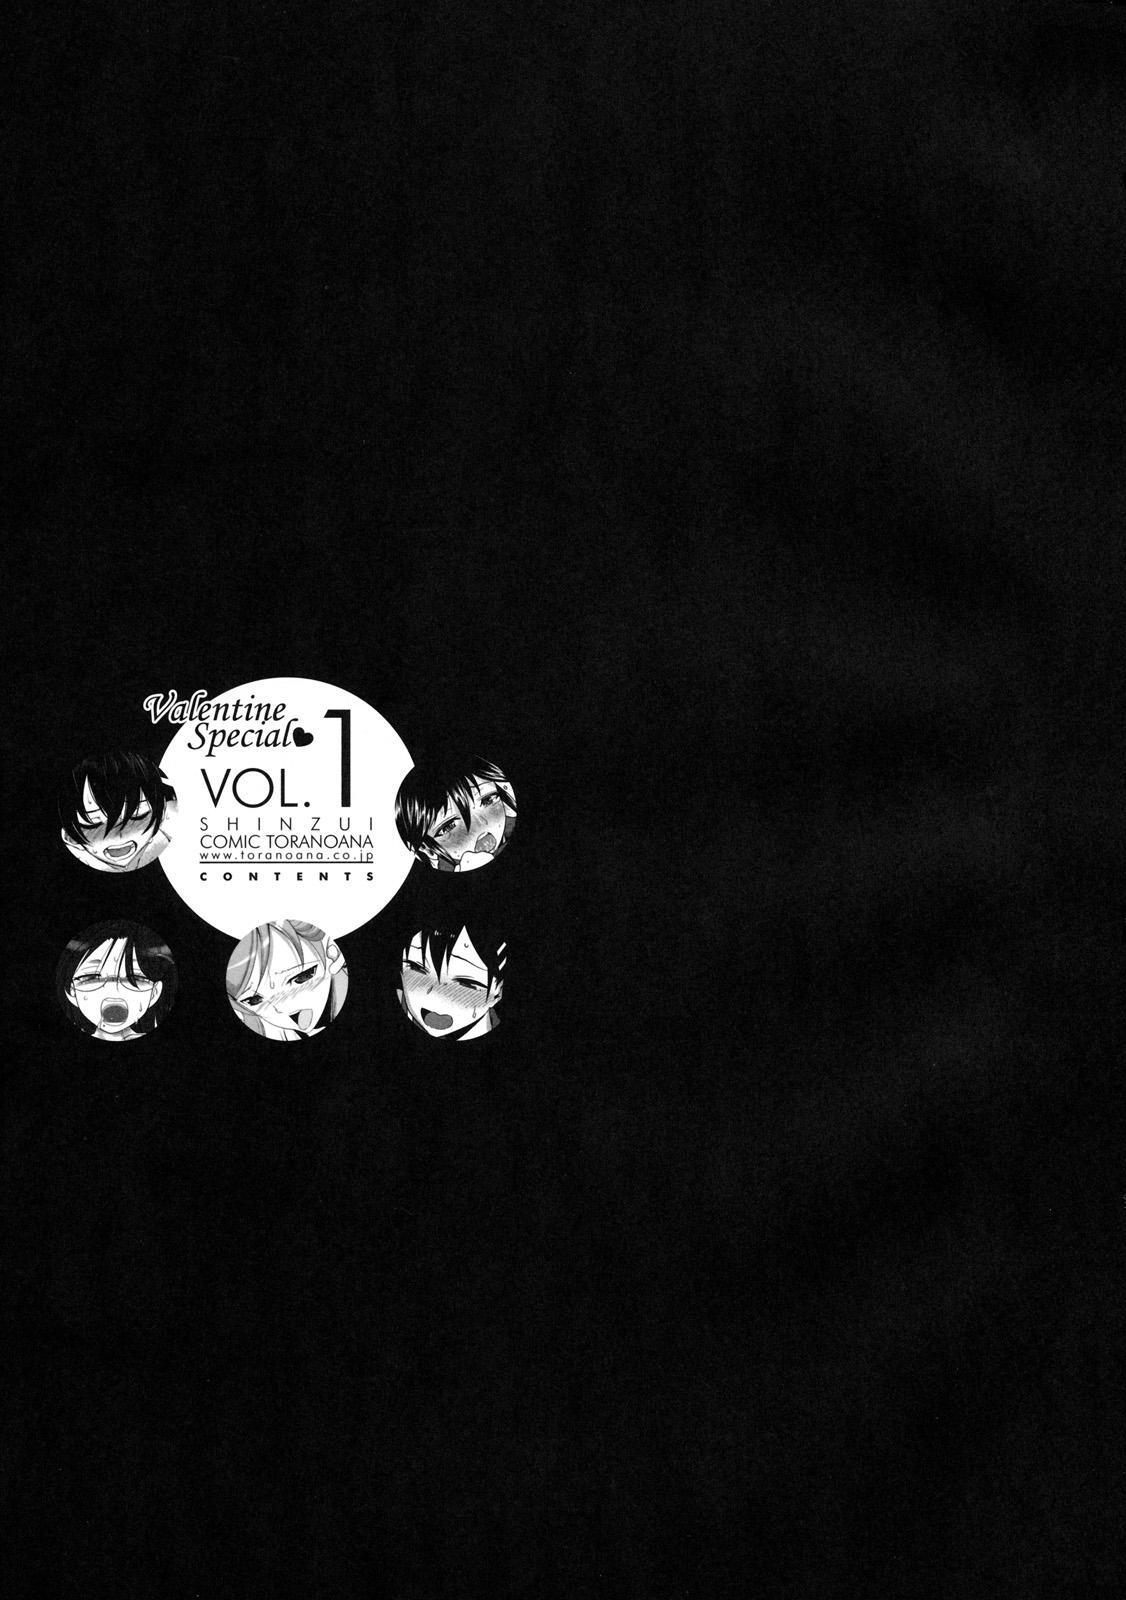 Shinzui Valentine Special Vol. 1 1